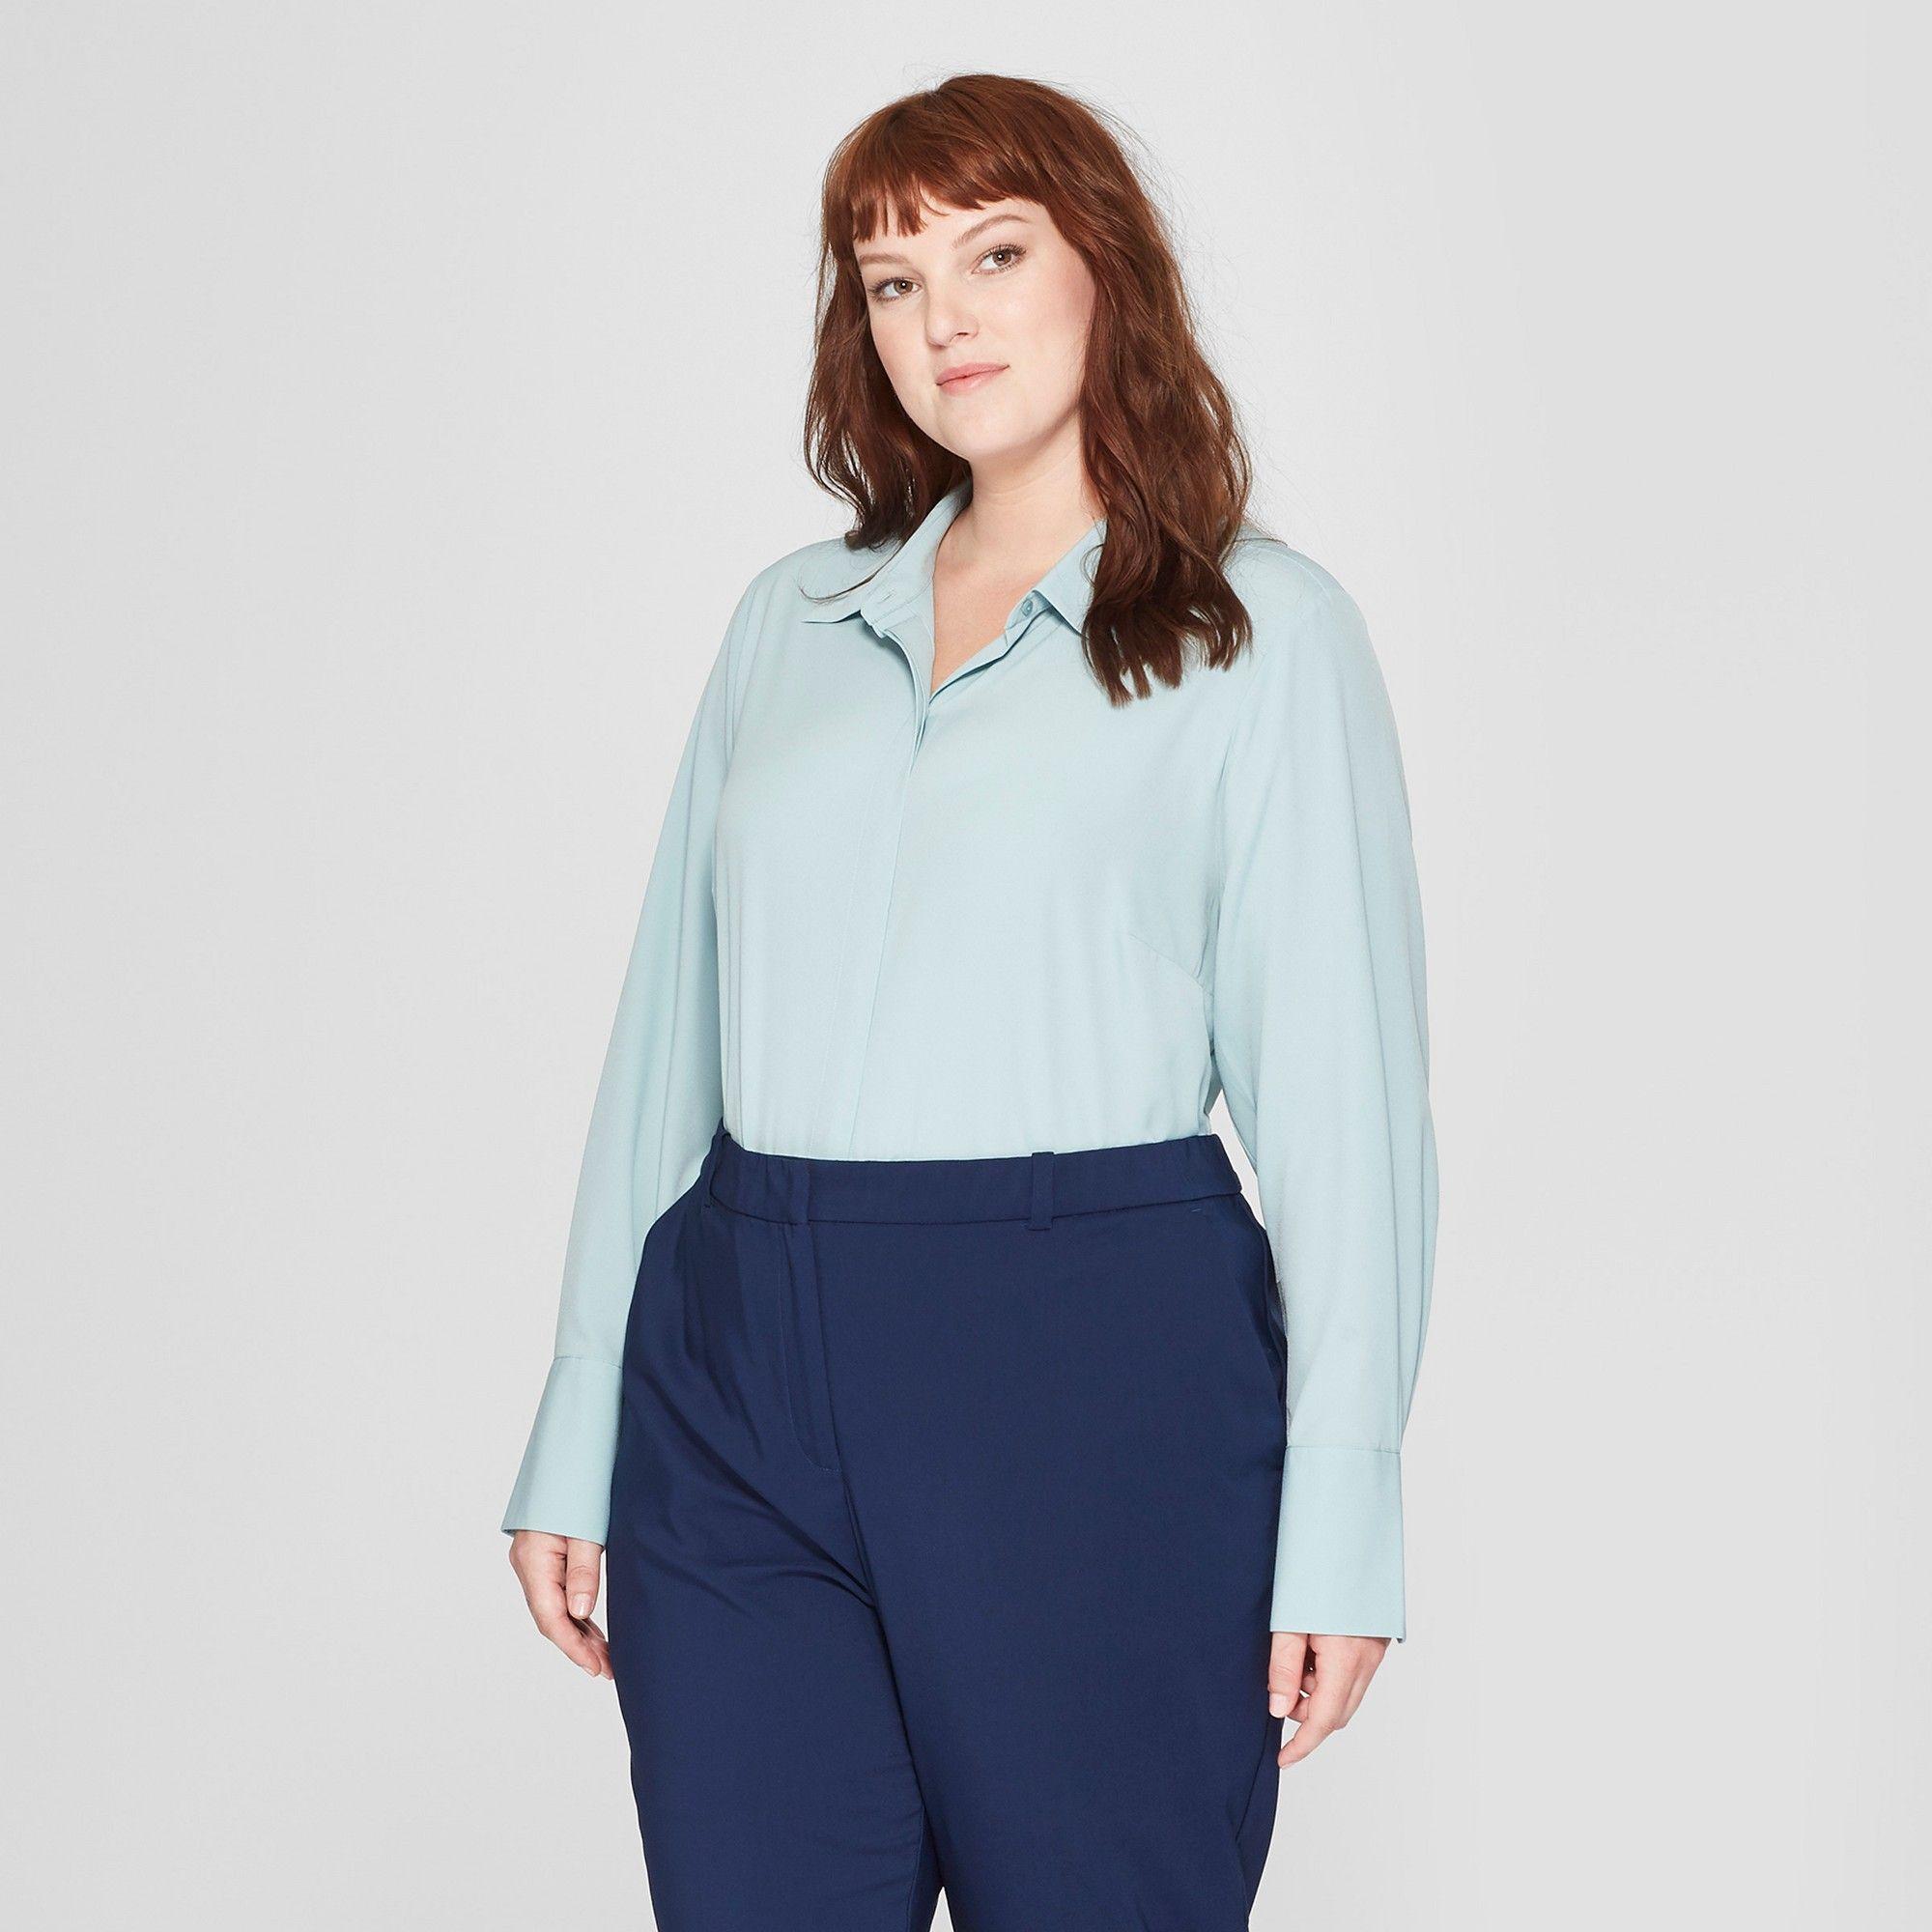 ead5a75df Women's Plus Size Long Sleeve Collared Button-Down Blouse - Prologue Blue 2X